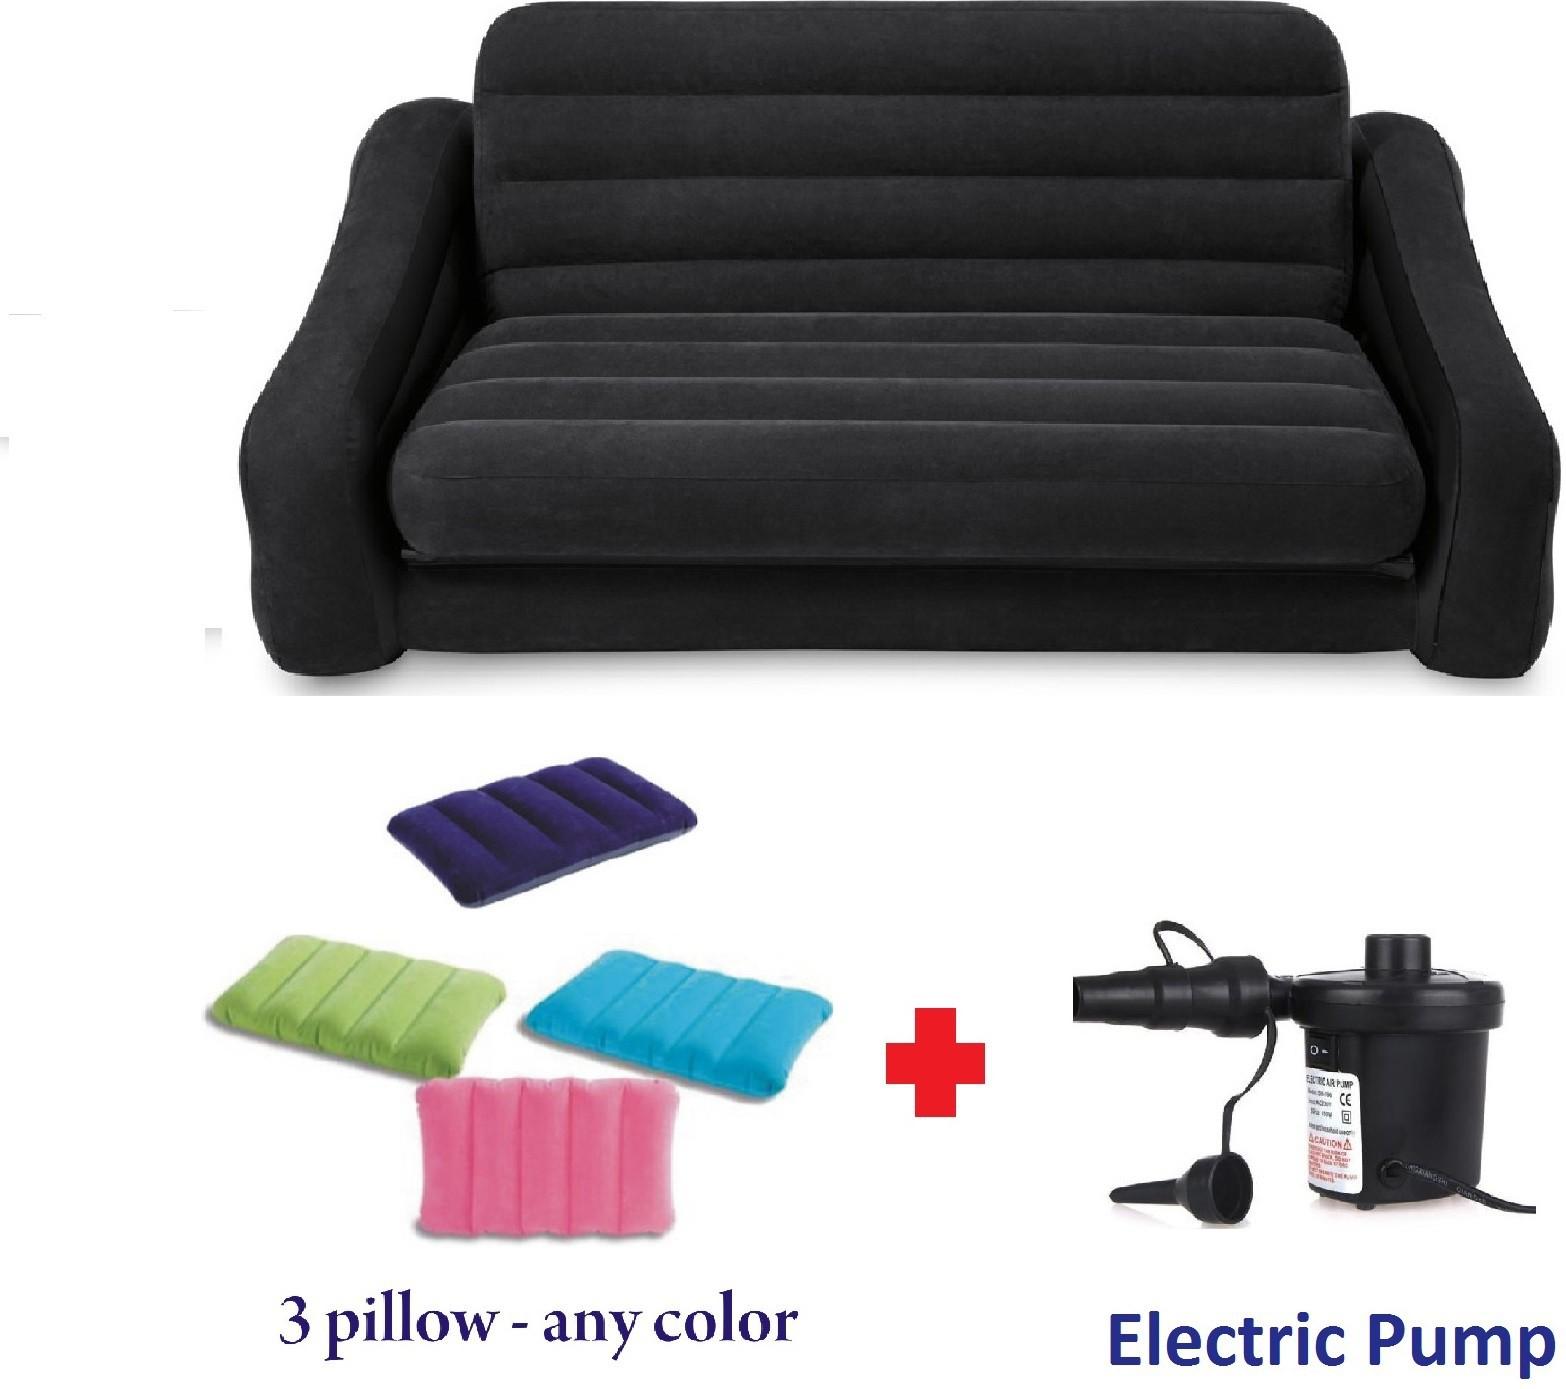 View VW Intex VW INTEX Sofa cum Bed Premium Series PVC 3 Seater Inflatable Sofa(Color - BLACK) Furniture (VW Intex)